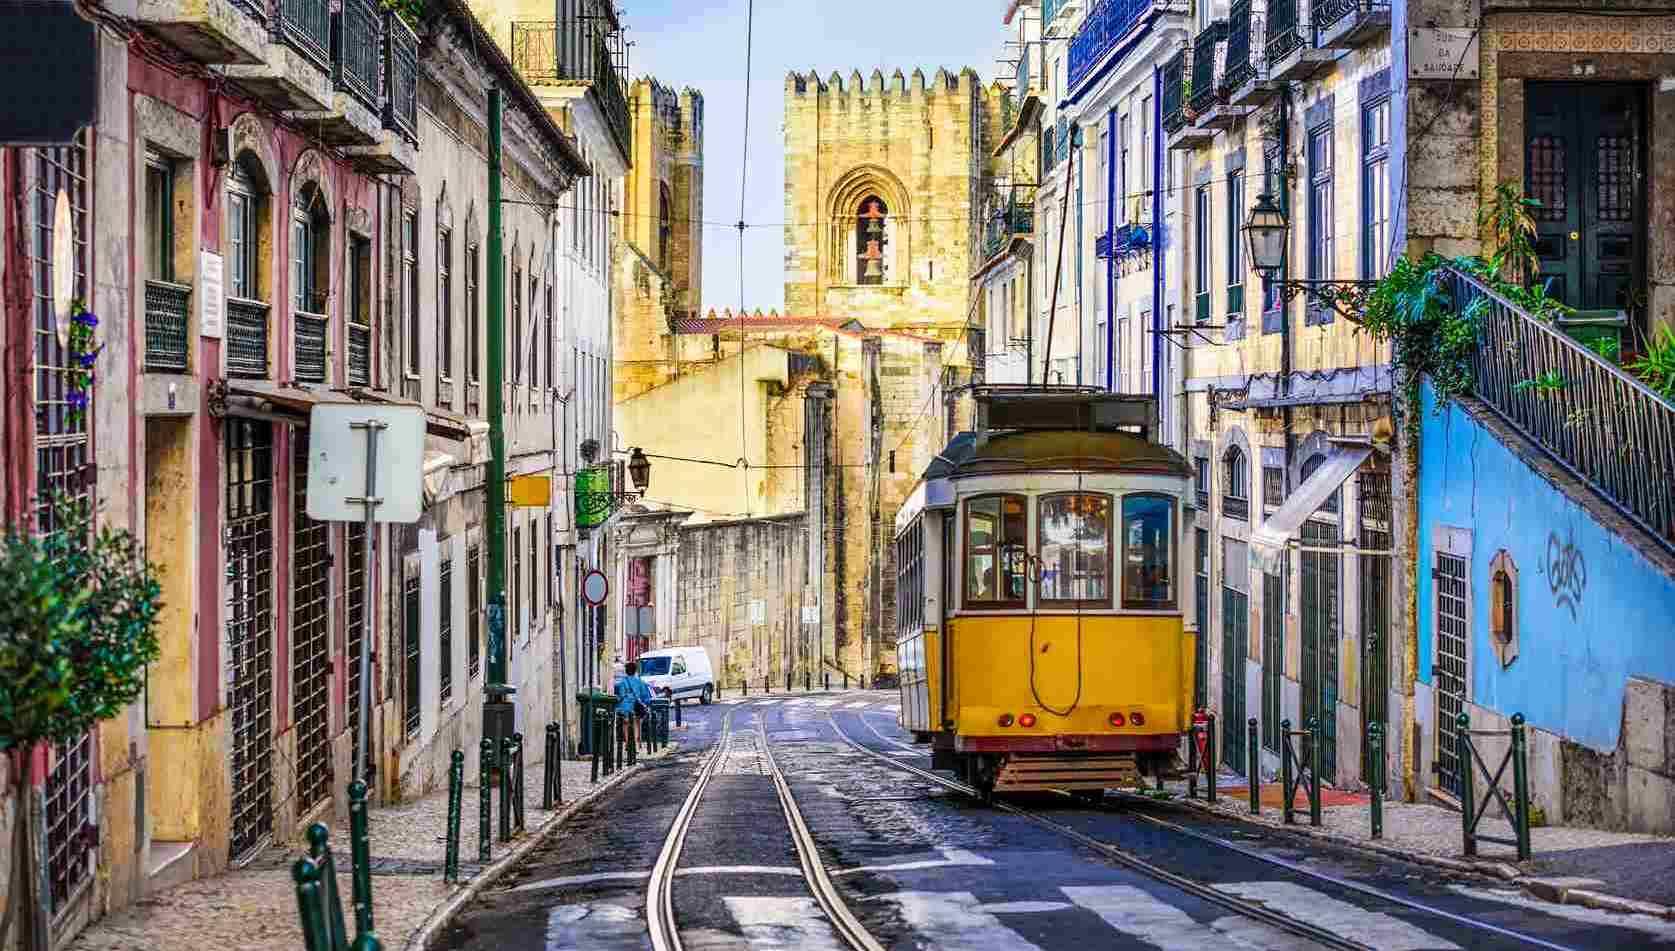 Ofertas de viajes a portugal lisboa